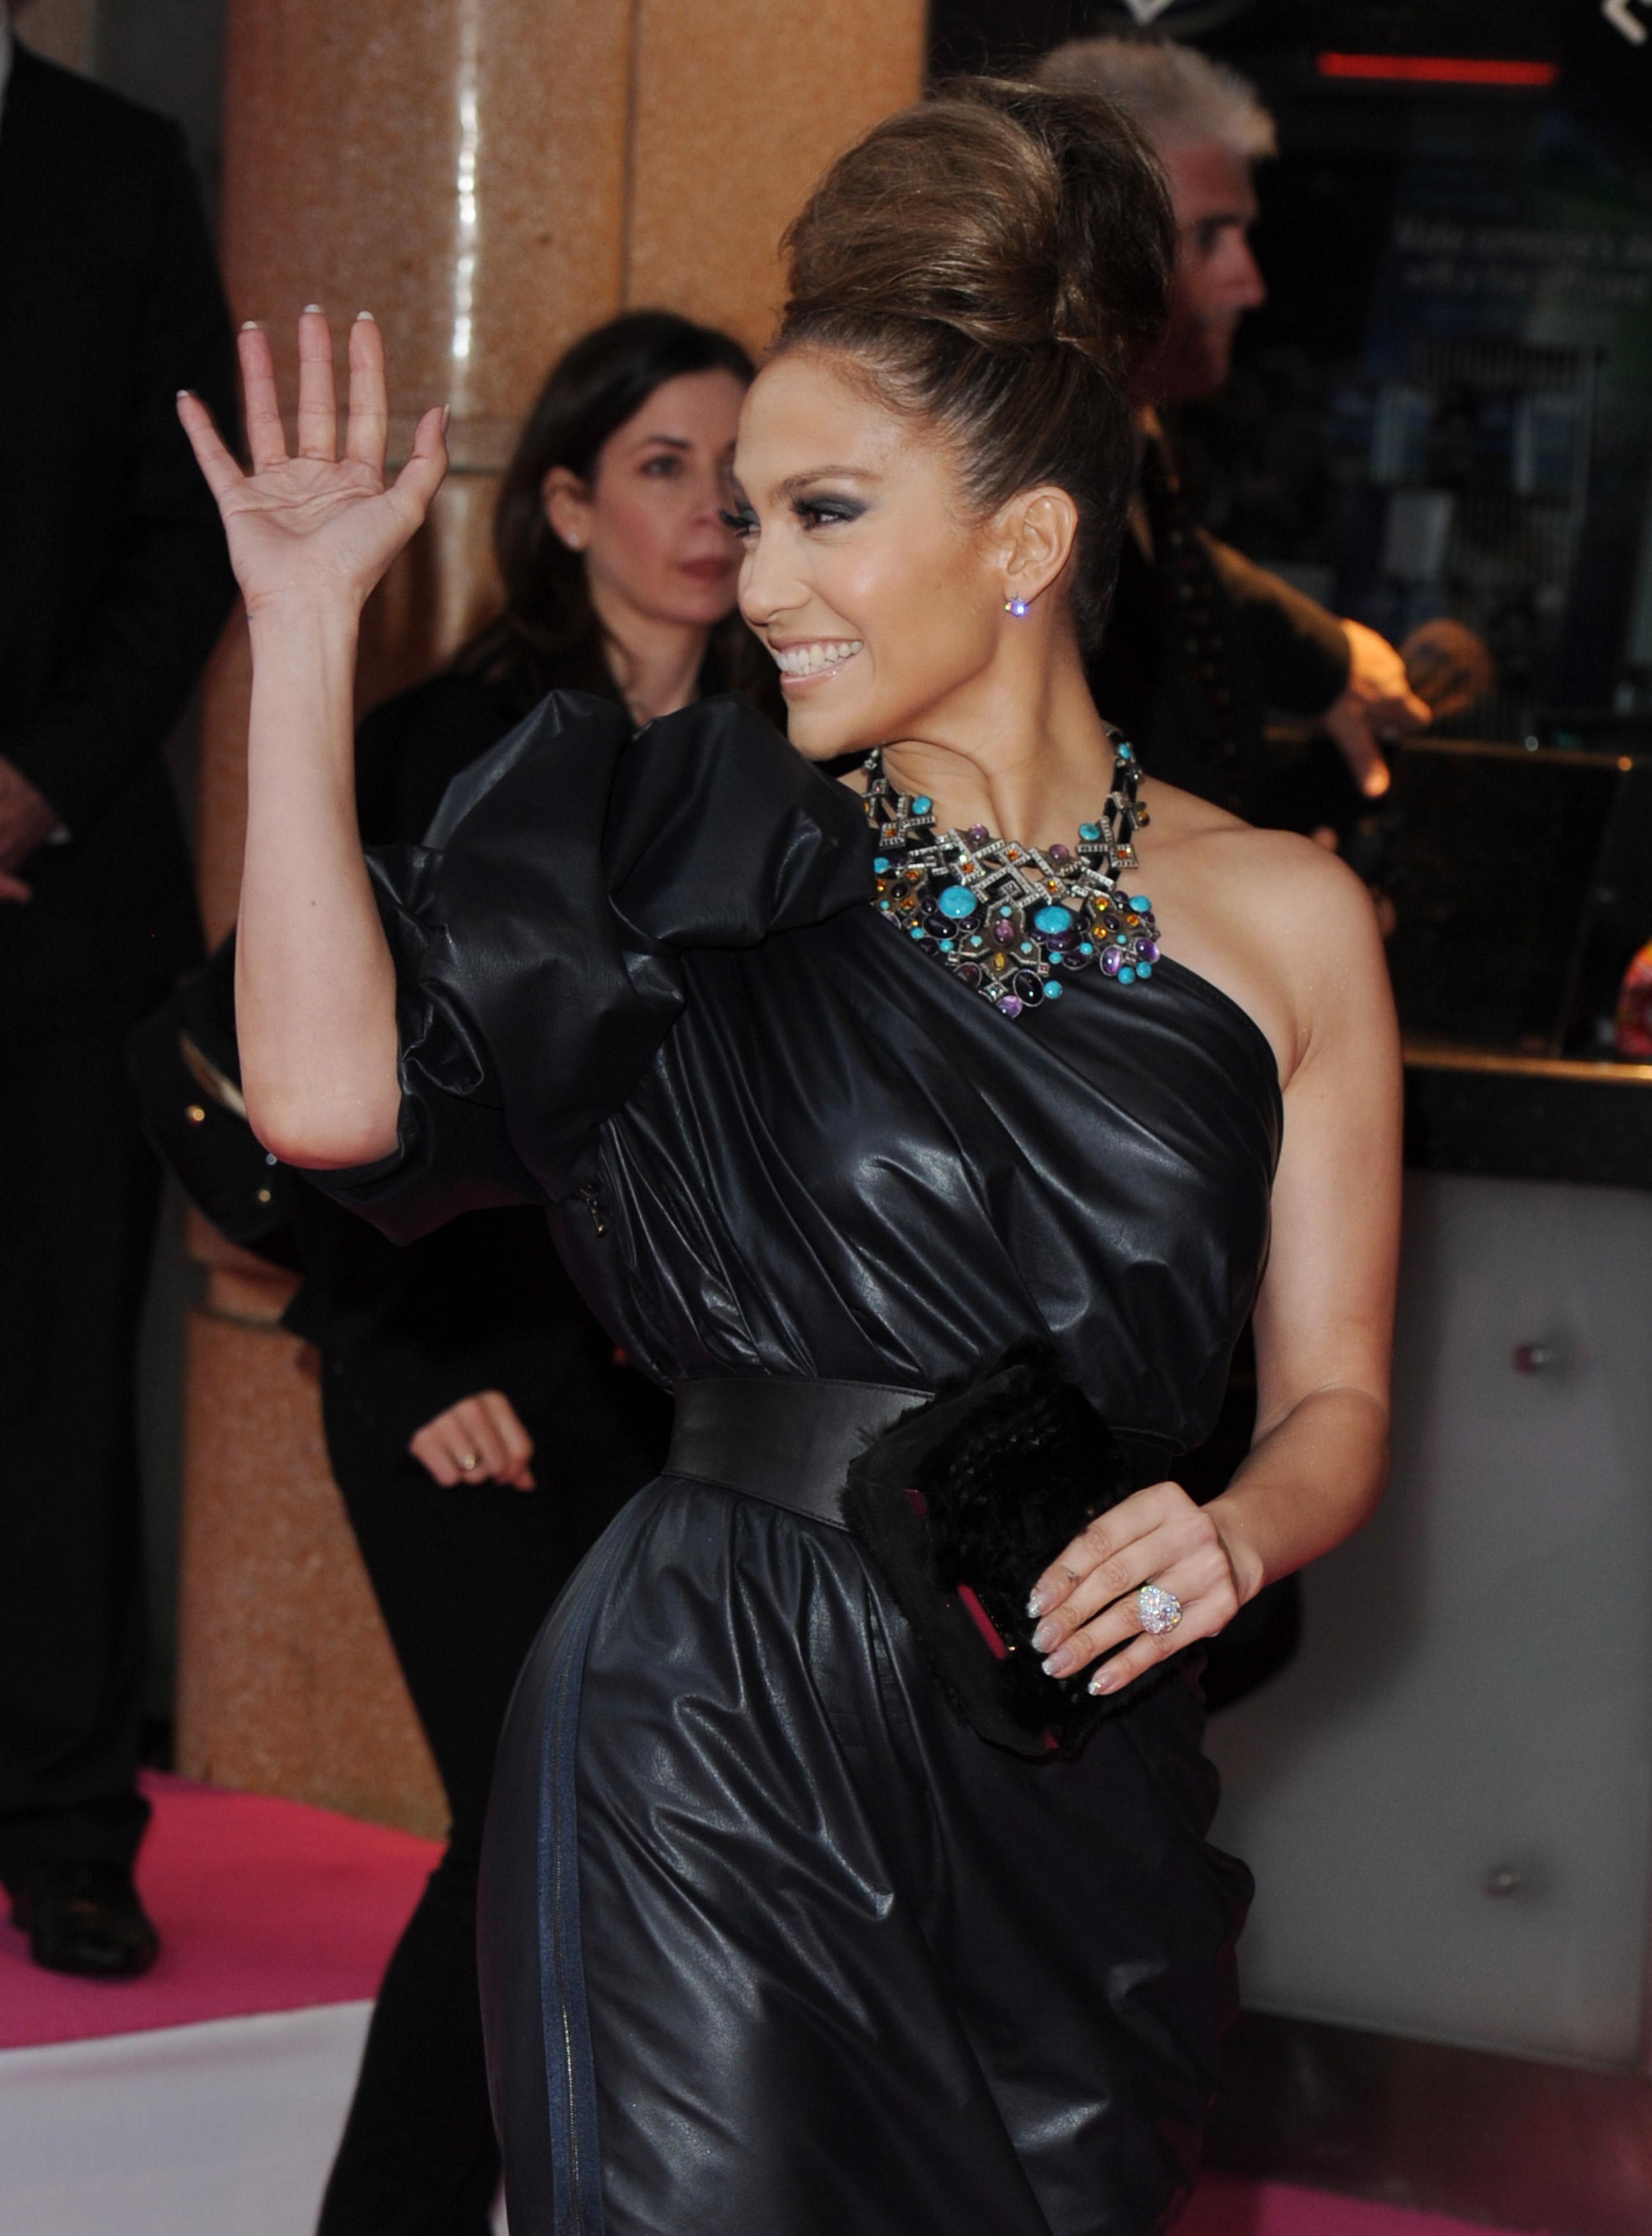 50520_celebrity_paradise.com_TheElder_JenniferLopez2010_04_28_TheBack_UpPlanUKPremiere112_122_231lo.jpg